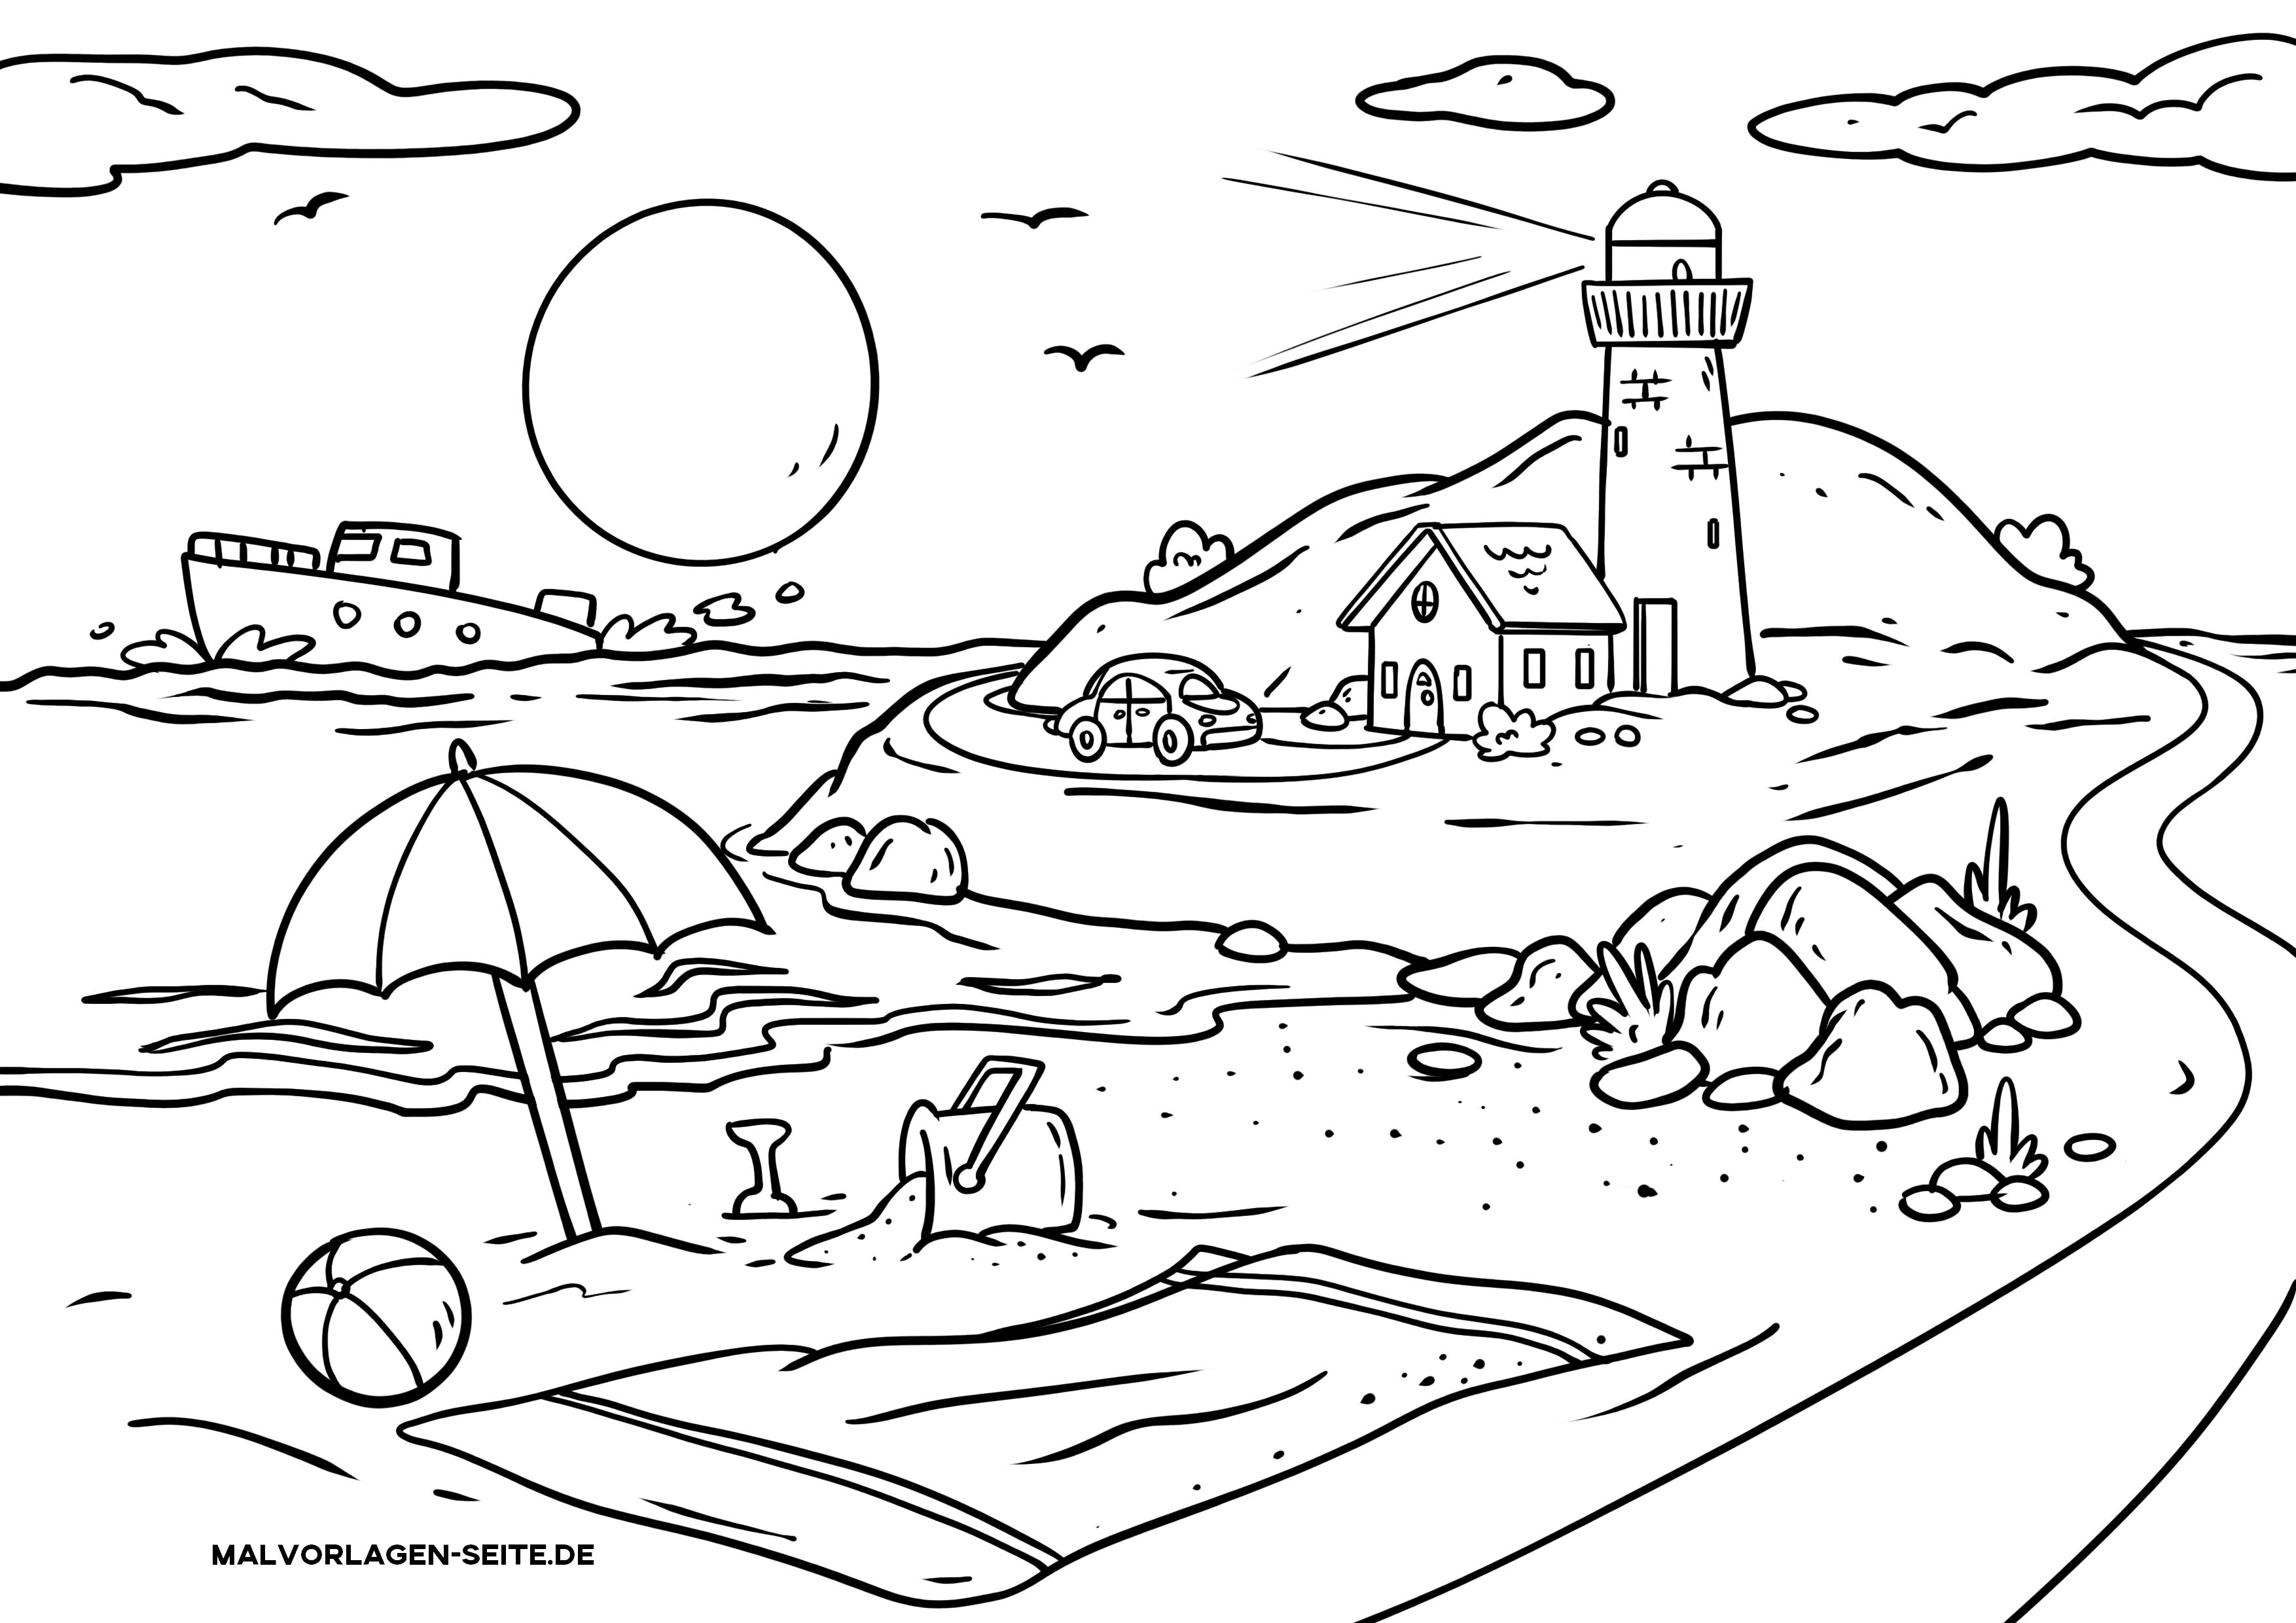 Malvorlagen Urlaub Strand Quest In 2021 Pencil Drawings Drawings Character